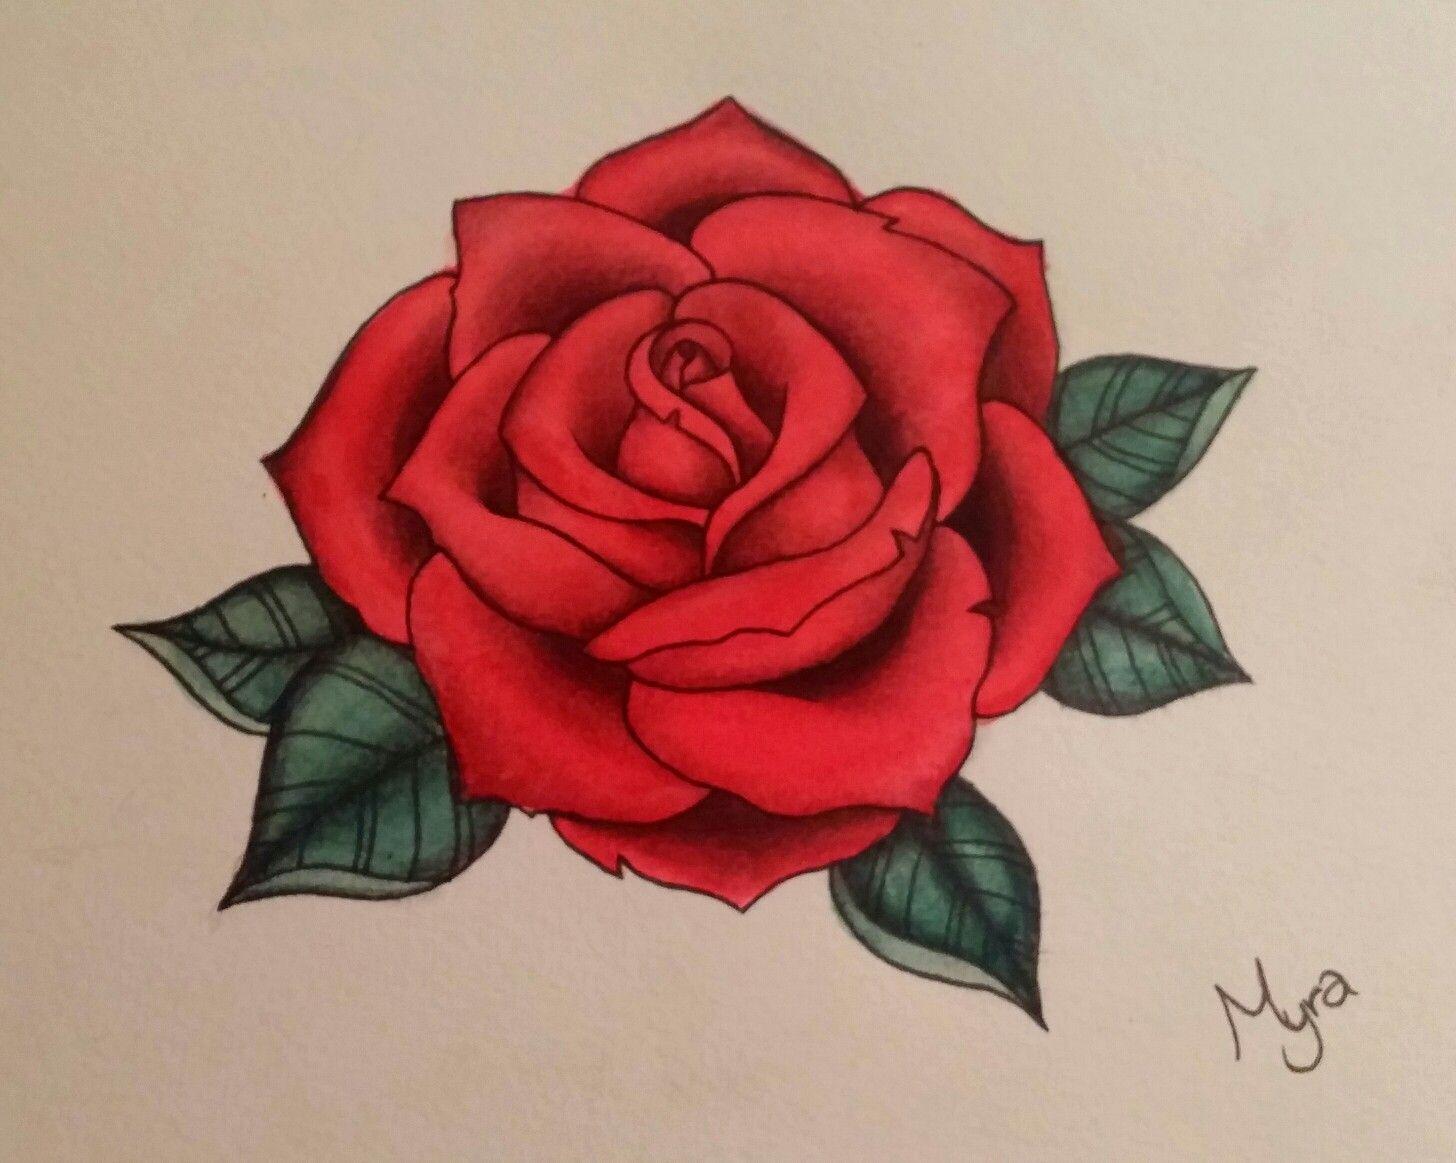 Rose Drawing Art Tattooflash Coloredpencil Rose Drawing Tattoo Red Rose Tattoo Rose Flower Tattoos